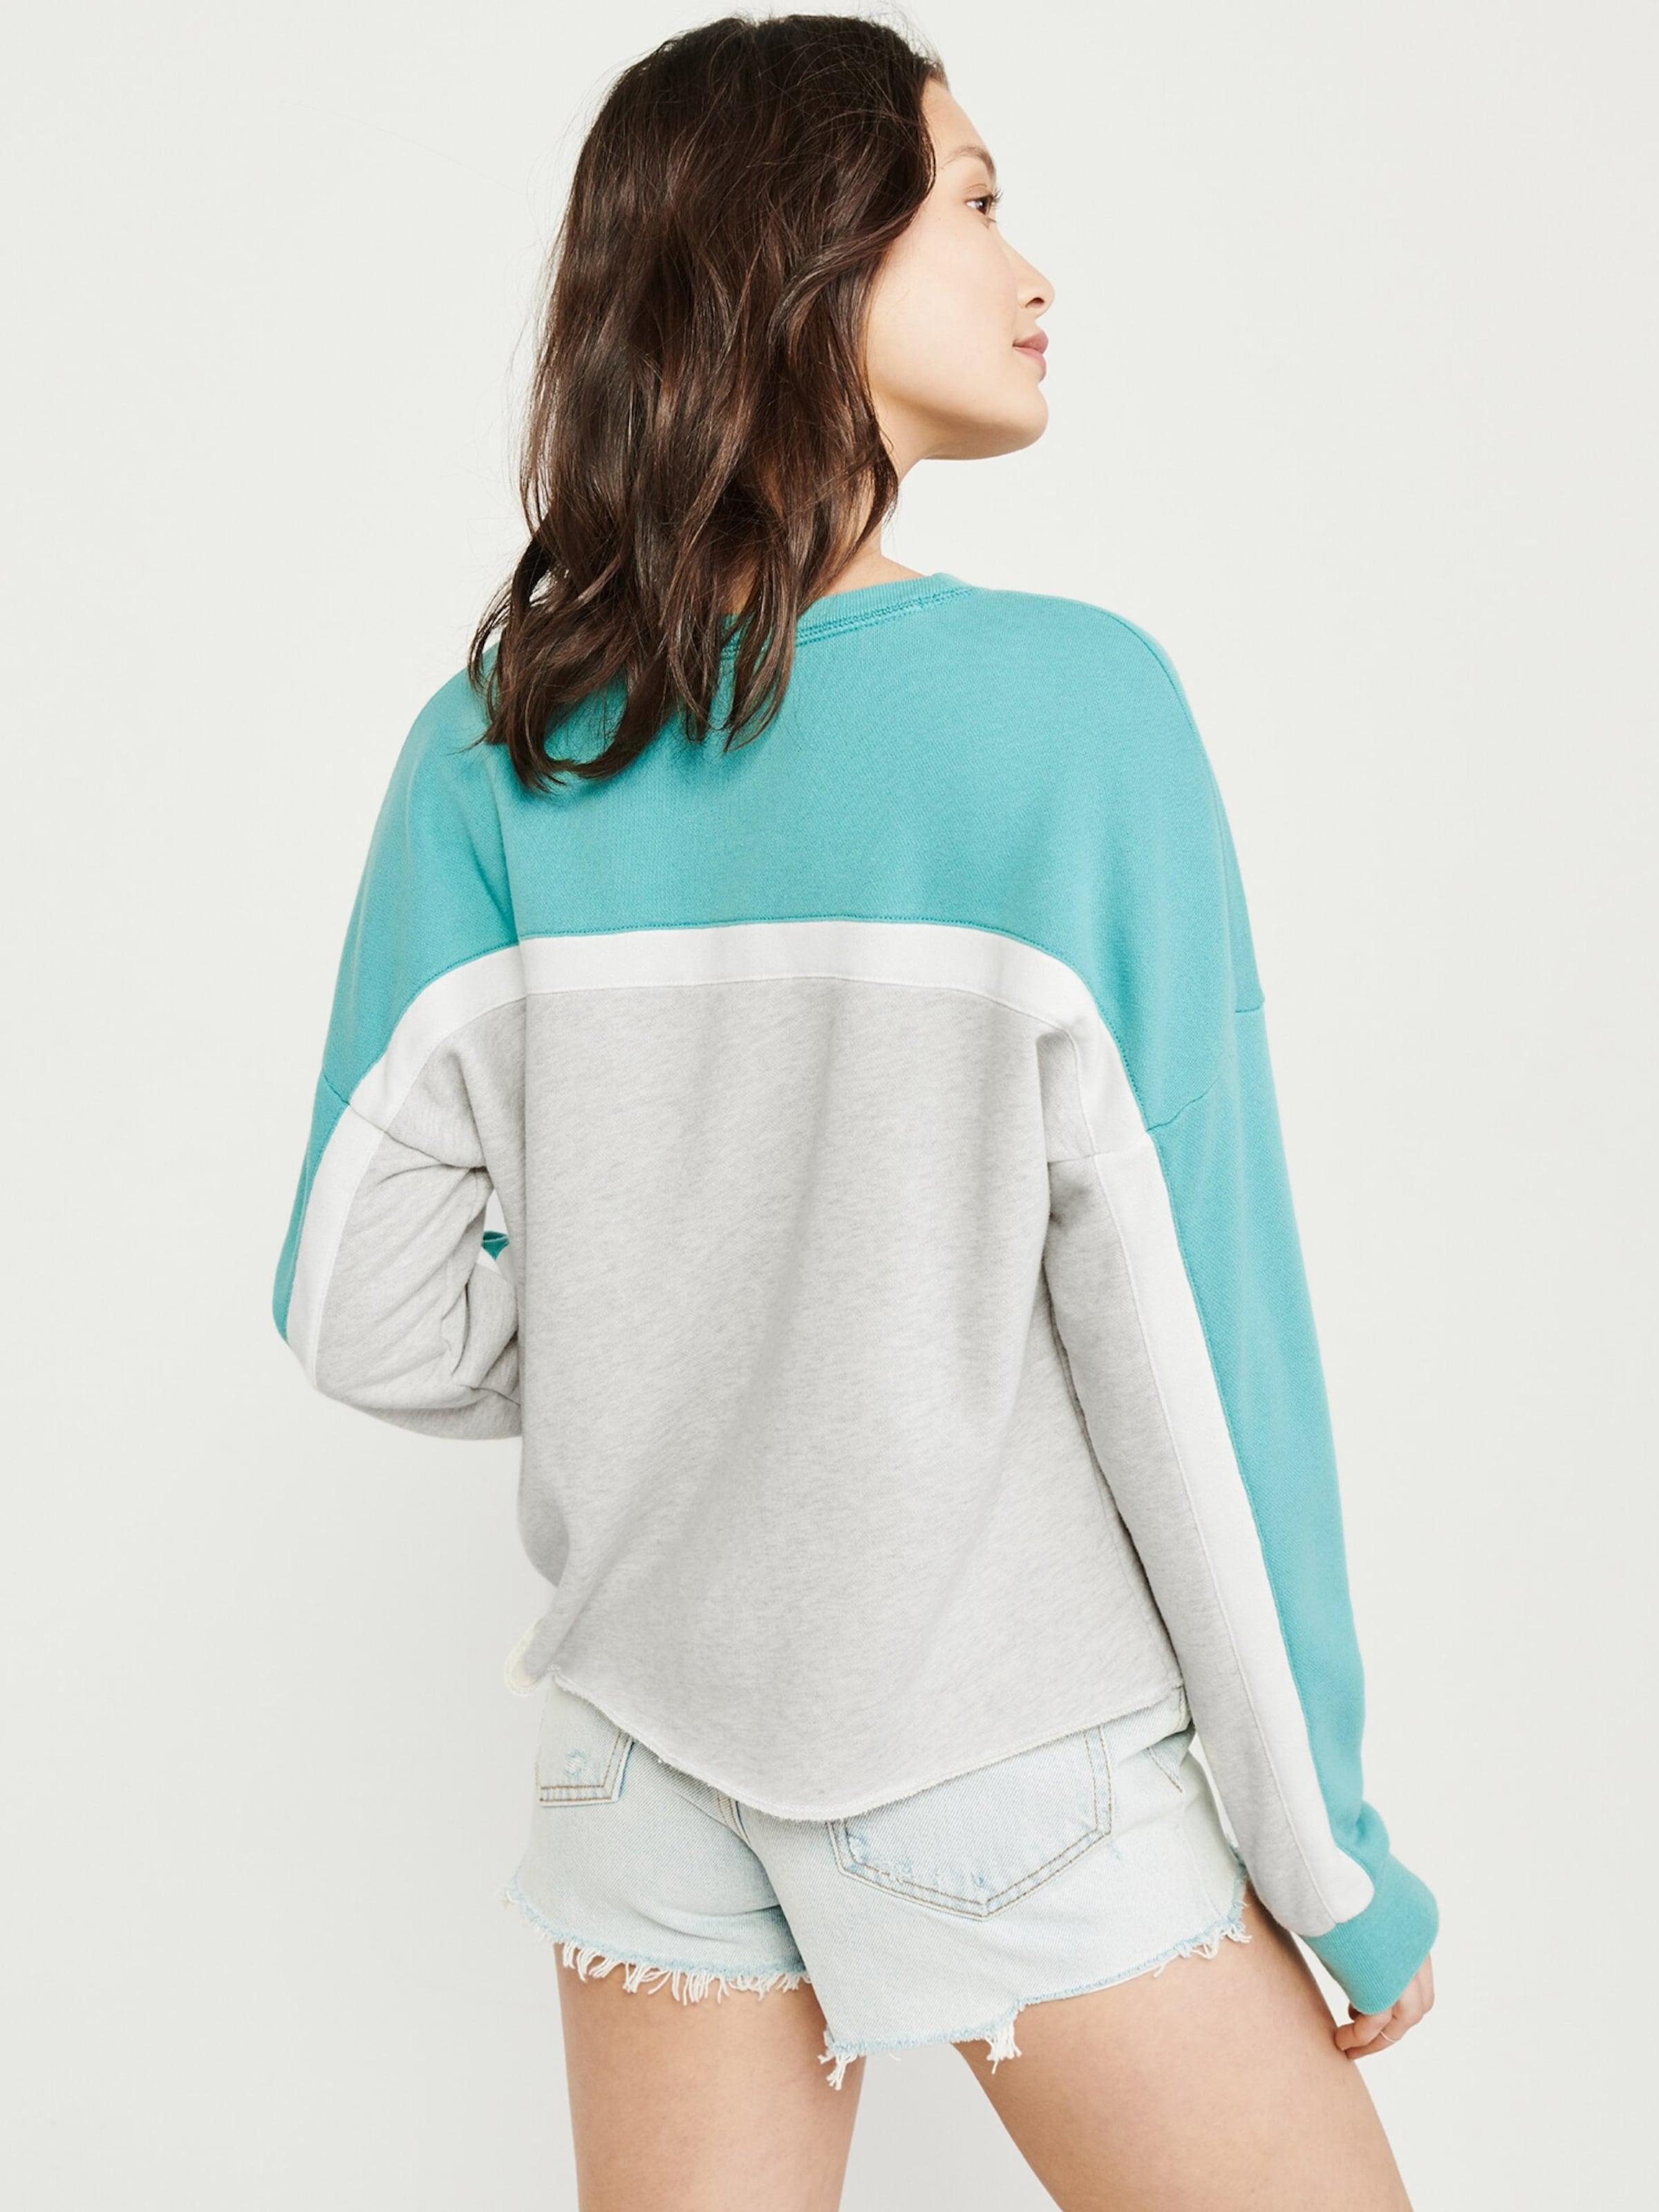 shirt Sweat En Crew' Abercrombieamp; 'seasonal TurquoiseGris Blanc Fitch 3F15ulKJcT